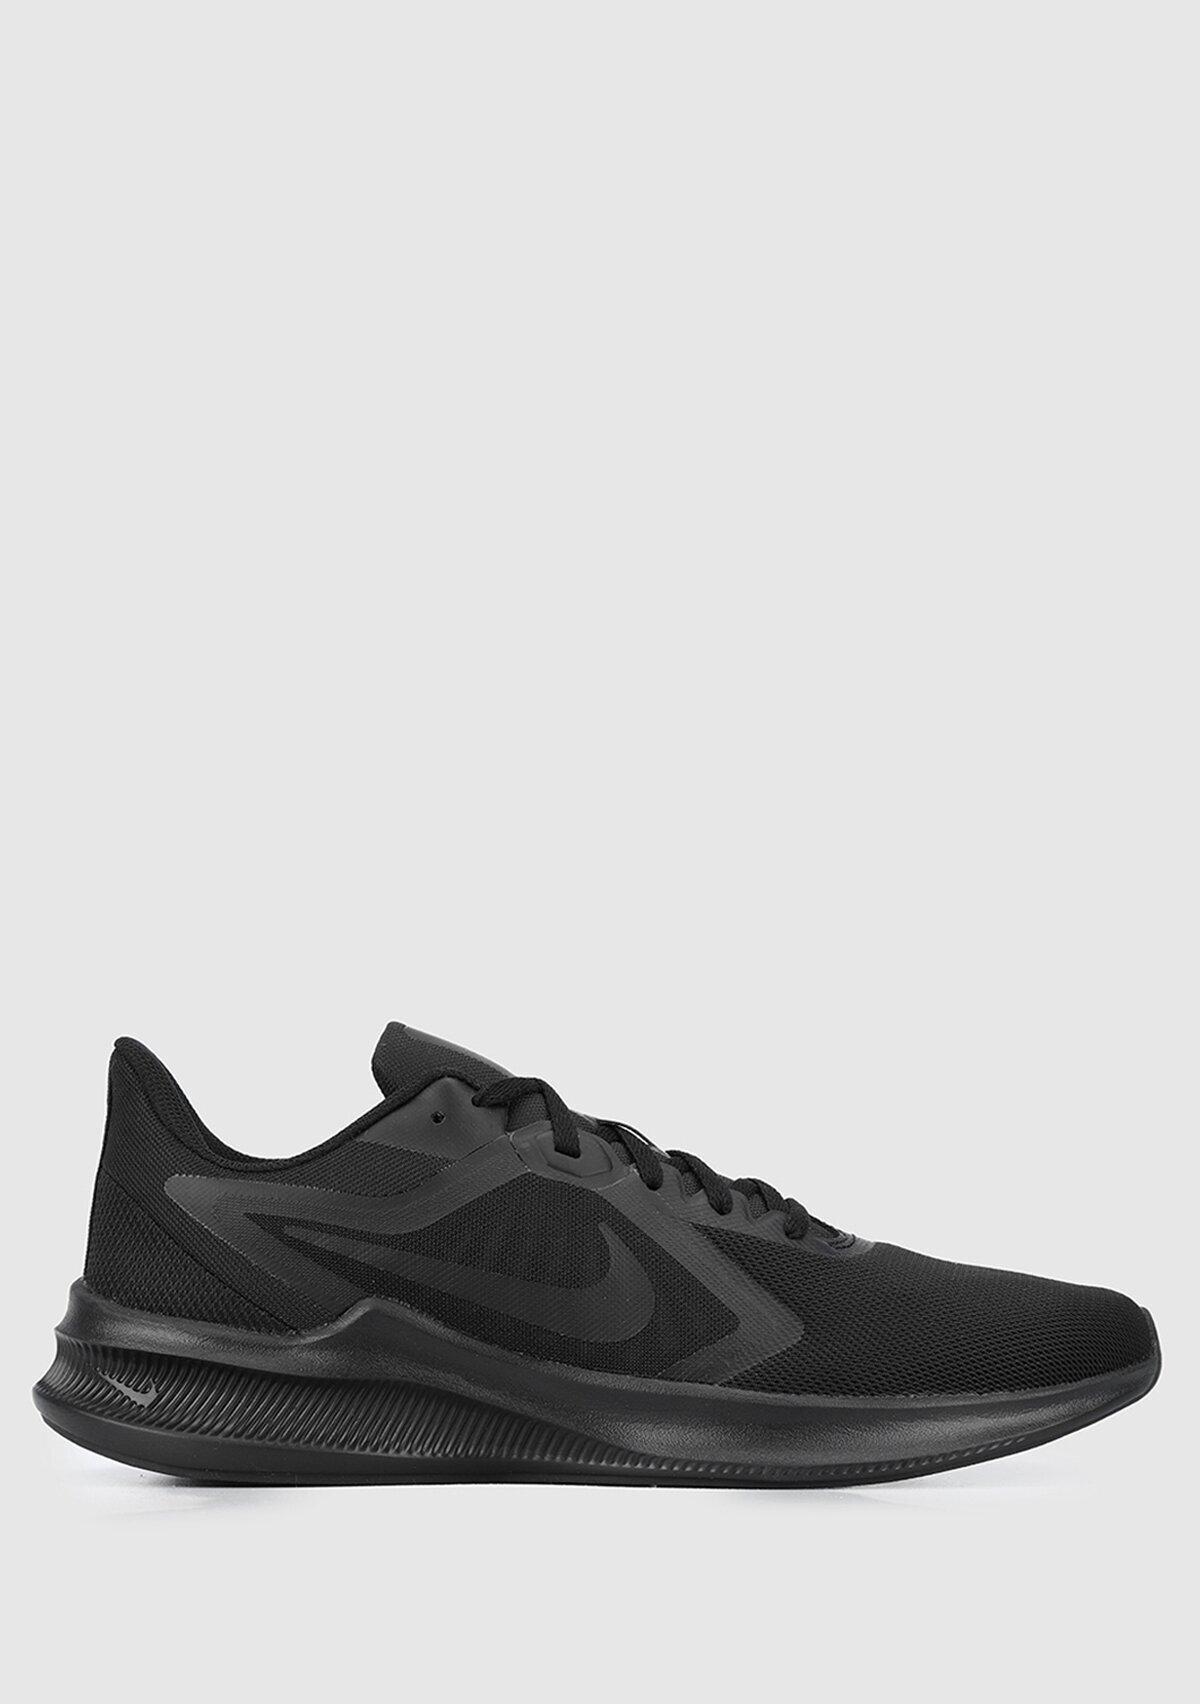 resm Downshifter Siyah Erkek Sneaker CI9981-002